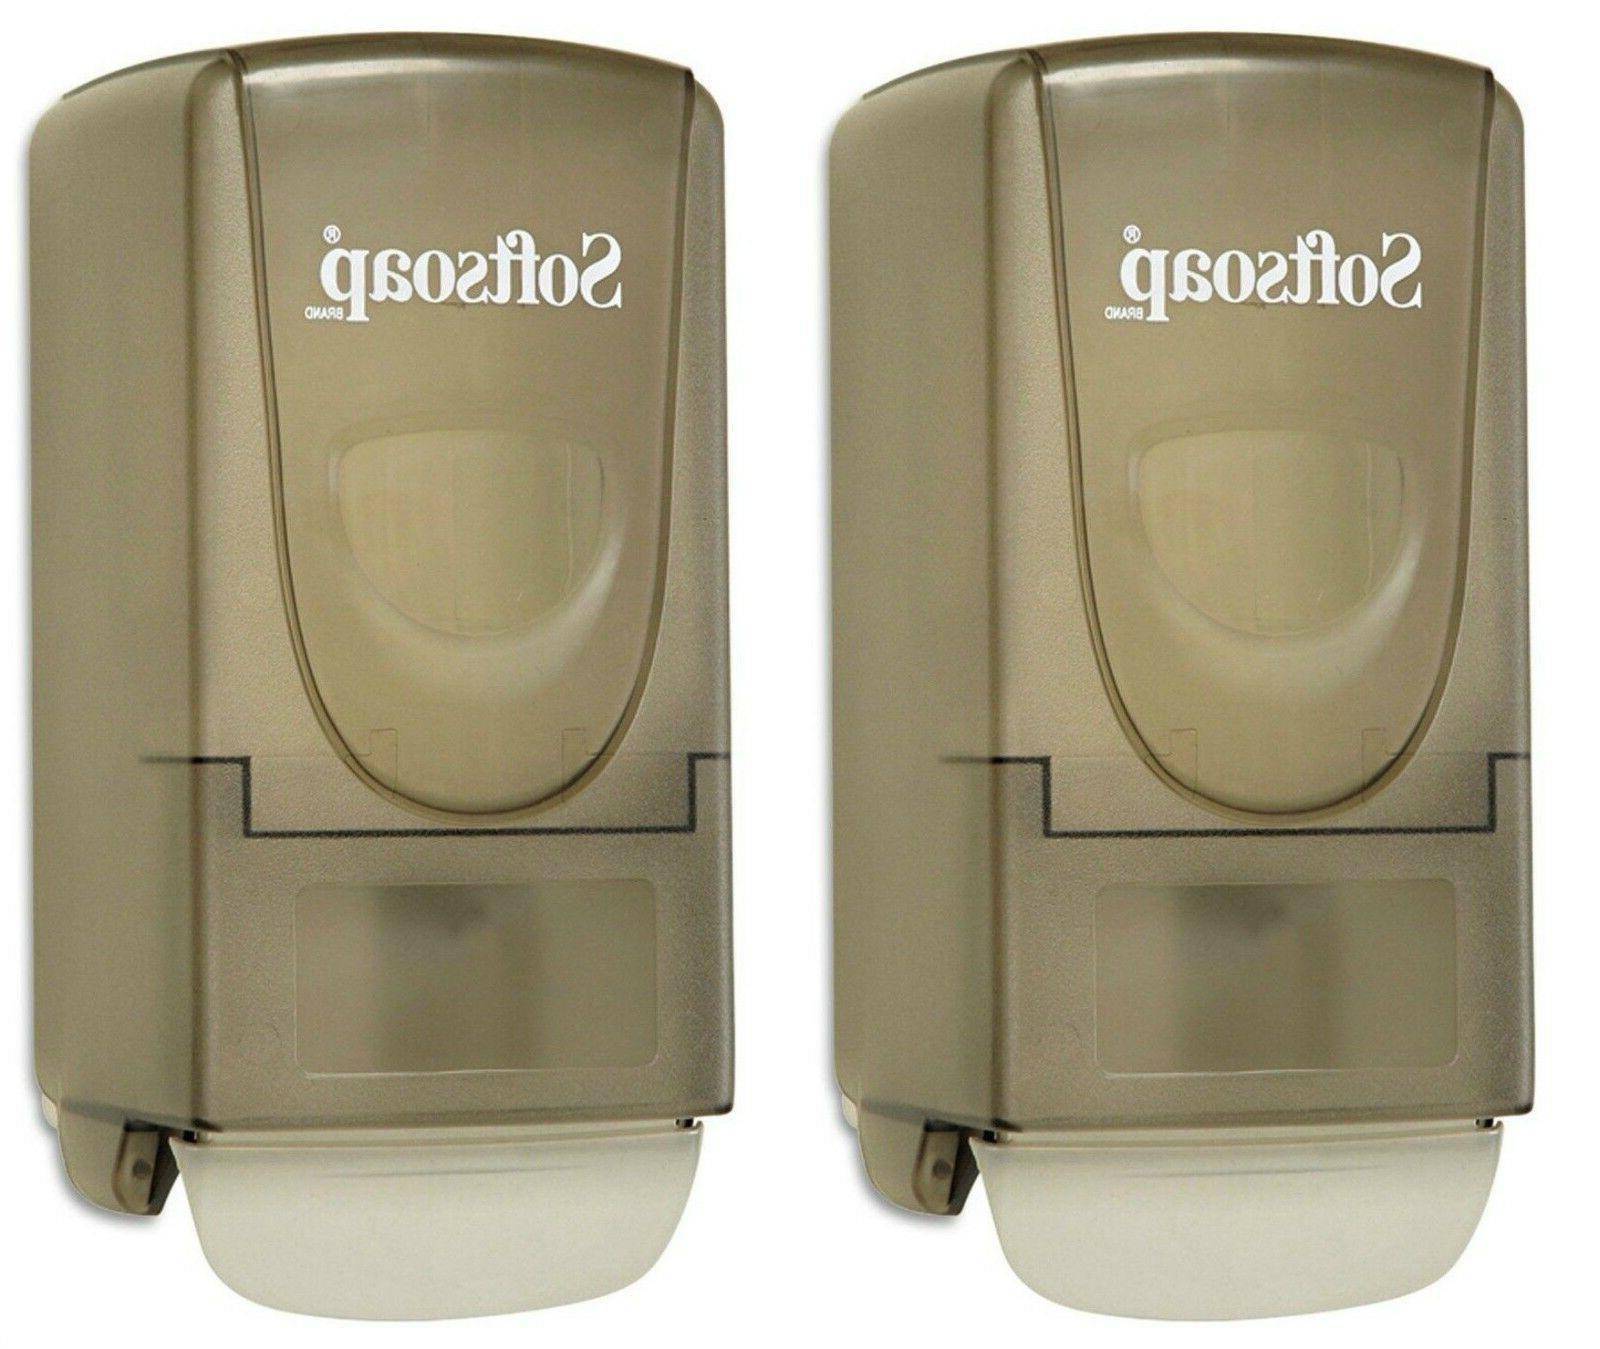 2 Softsoap Liquid Lotion Hand Soap Bathroom Deluxe Dispenser